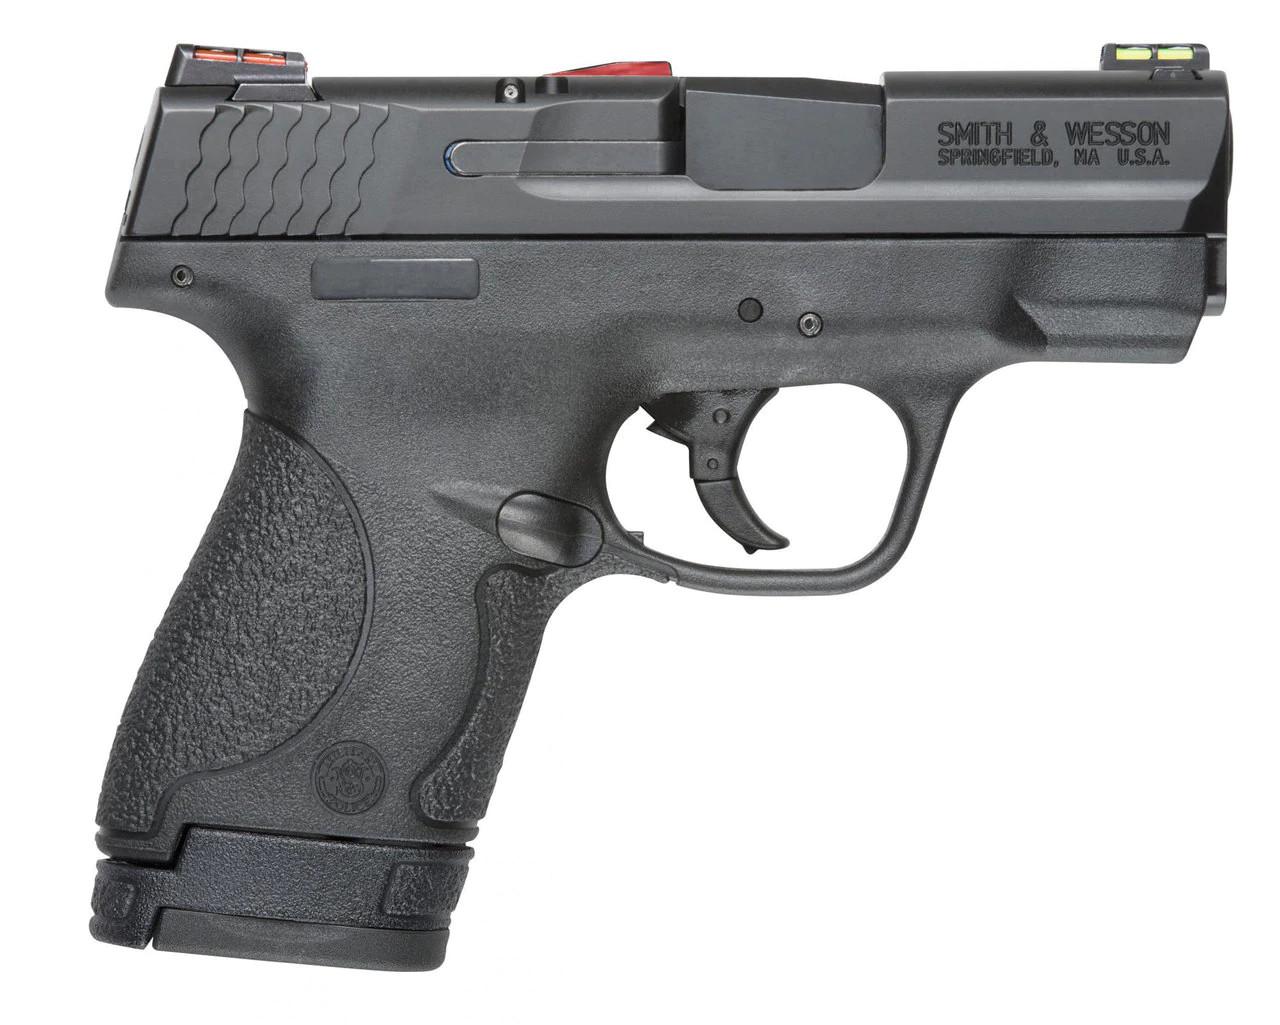 S&W M&P Shield Hi Viz With Crimson Trace Weapons Light CALIFORNIA LEGAL - 9mm